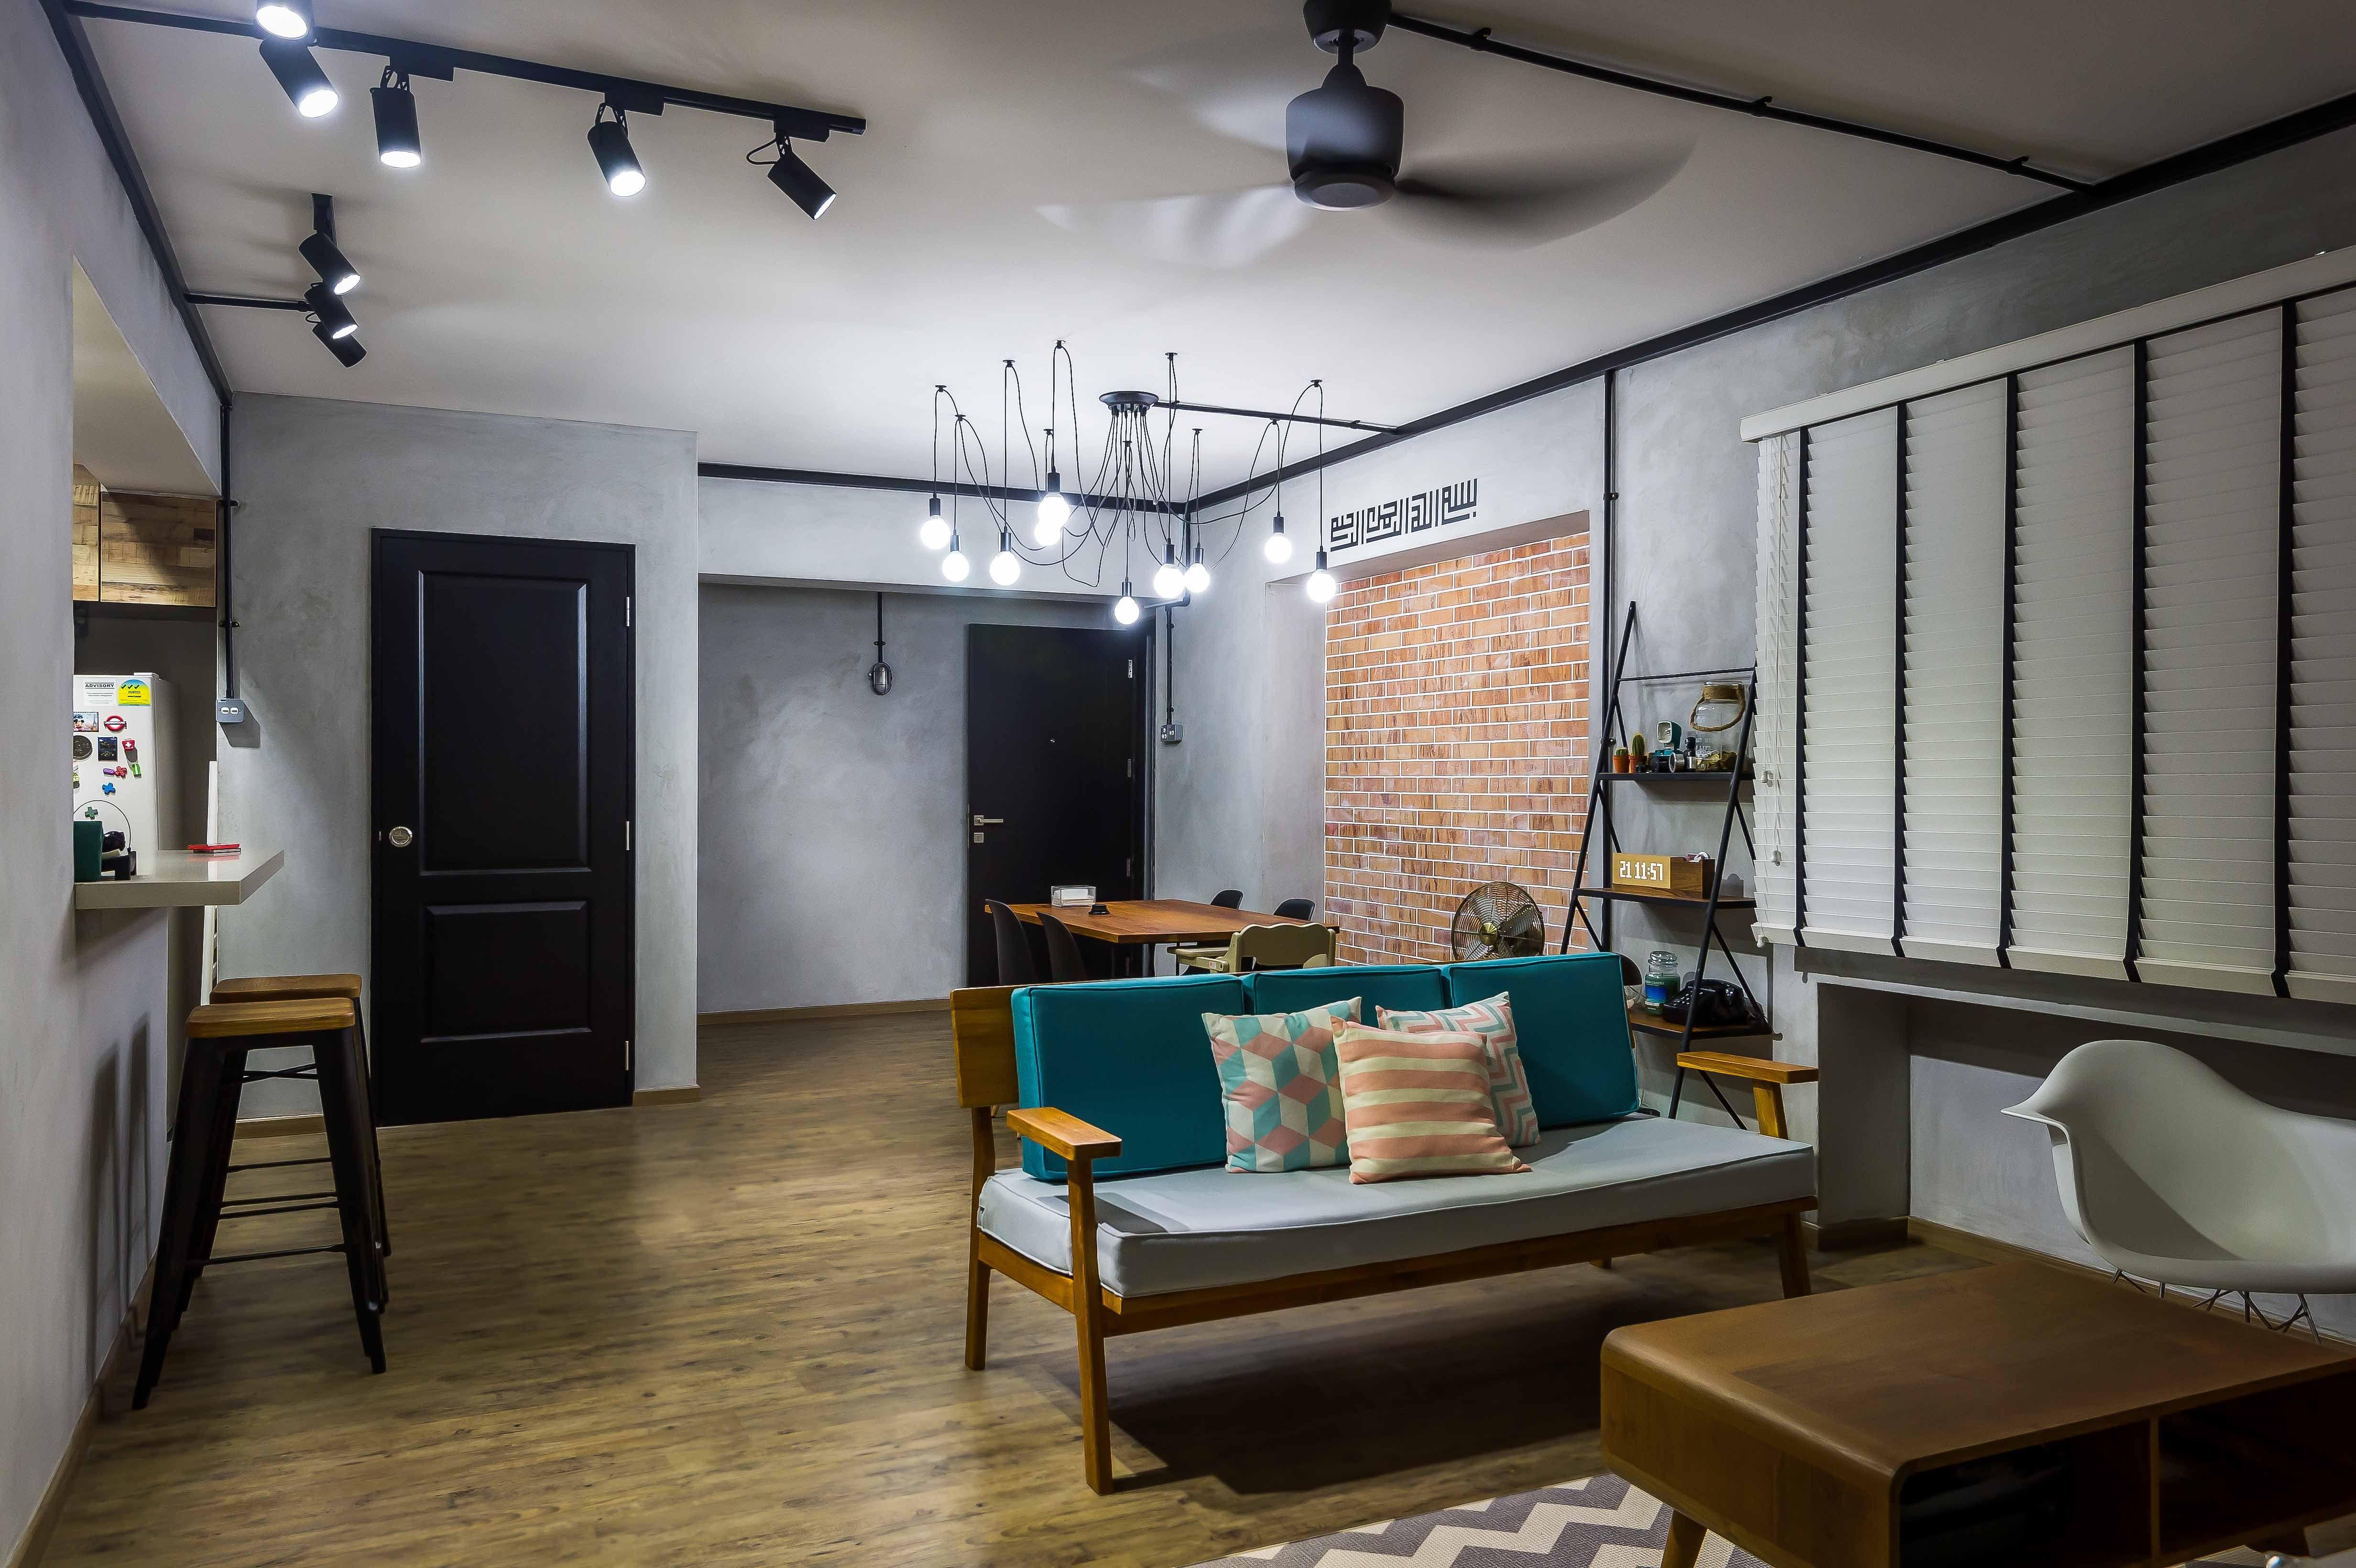 Industrial Themed Hdb 5room Re Sale By Bayti Design Pte Ltd Decoracao Futura Casa Casas